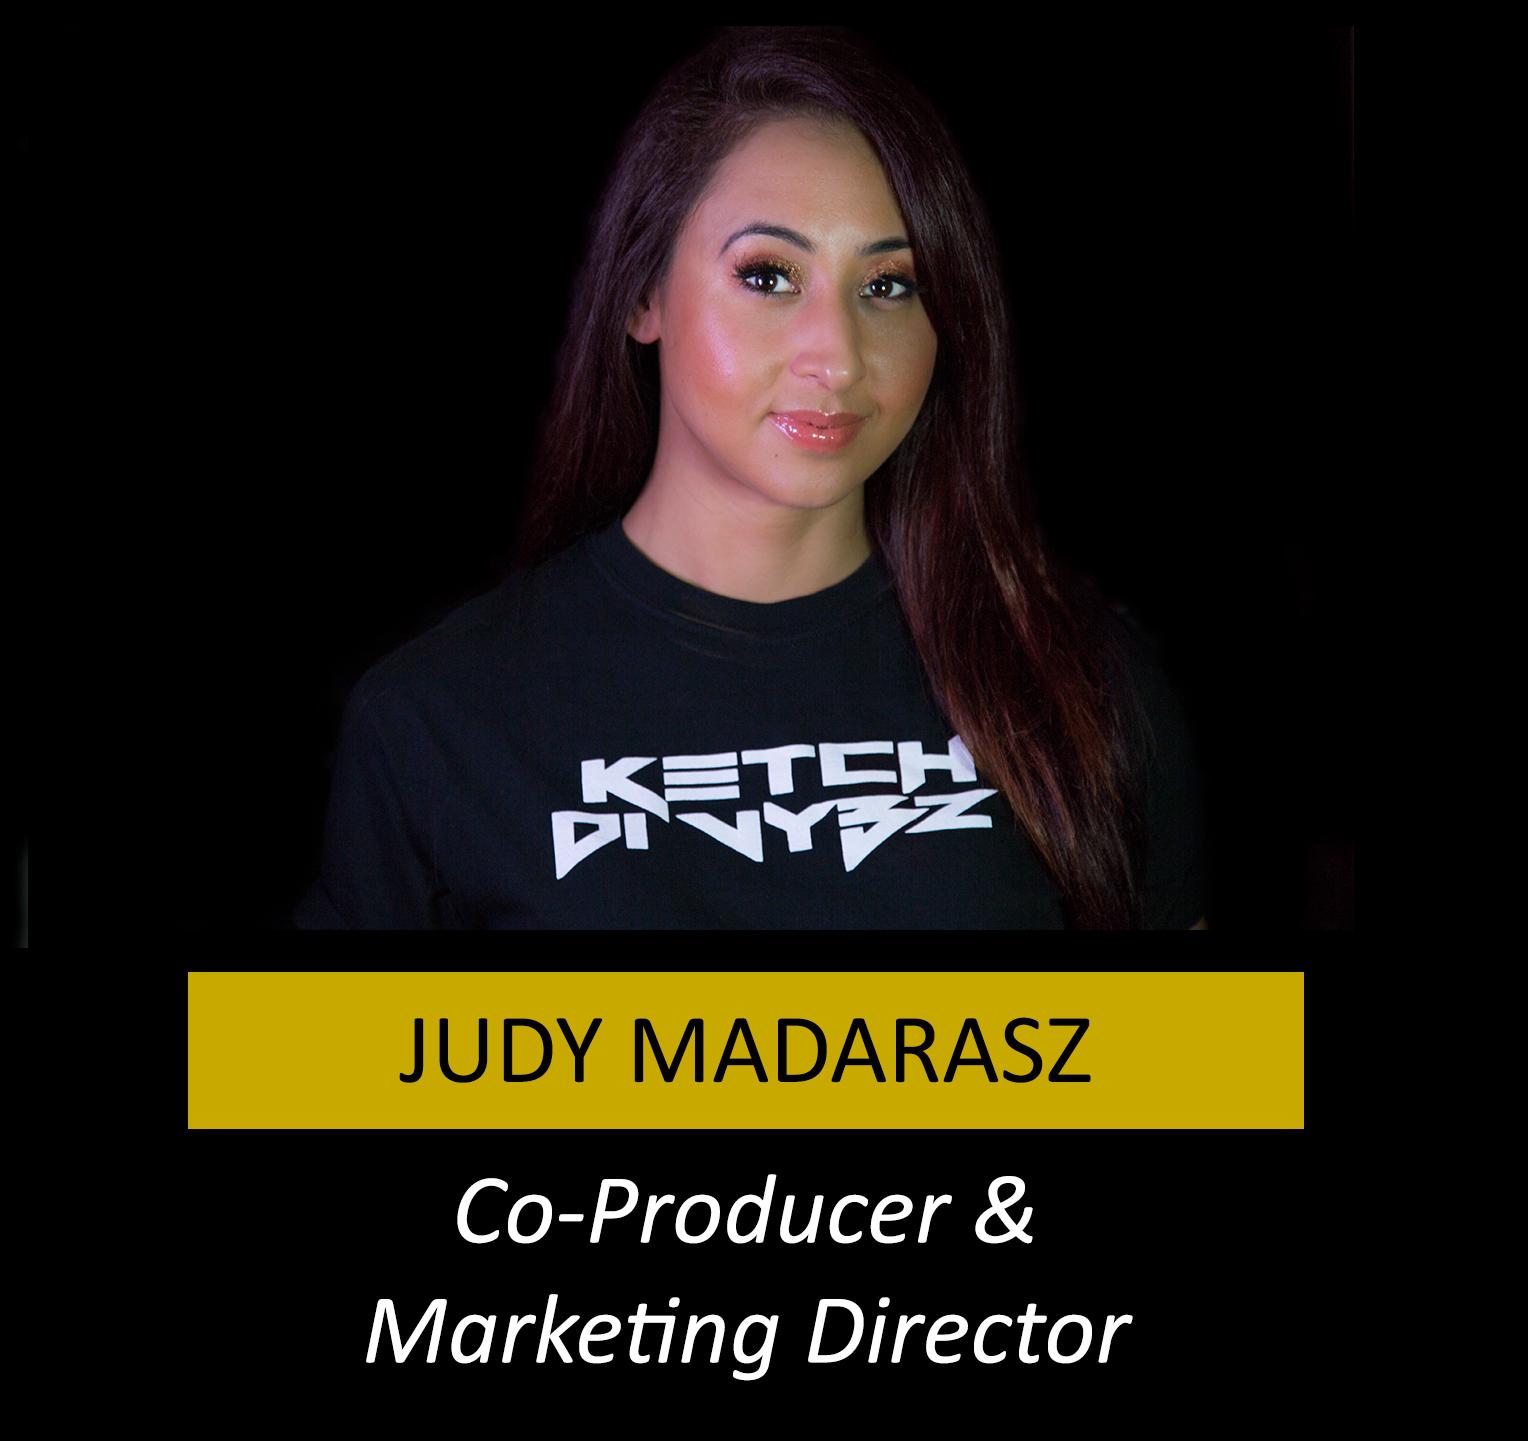 Click to read bio: Judy